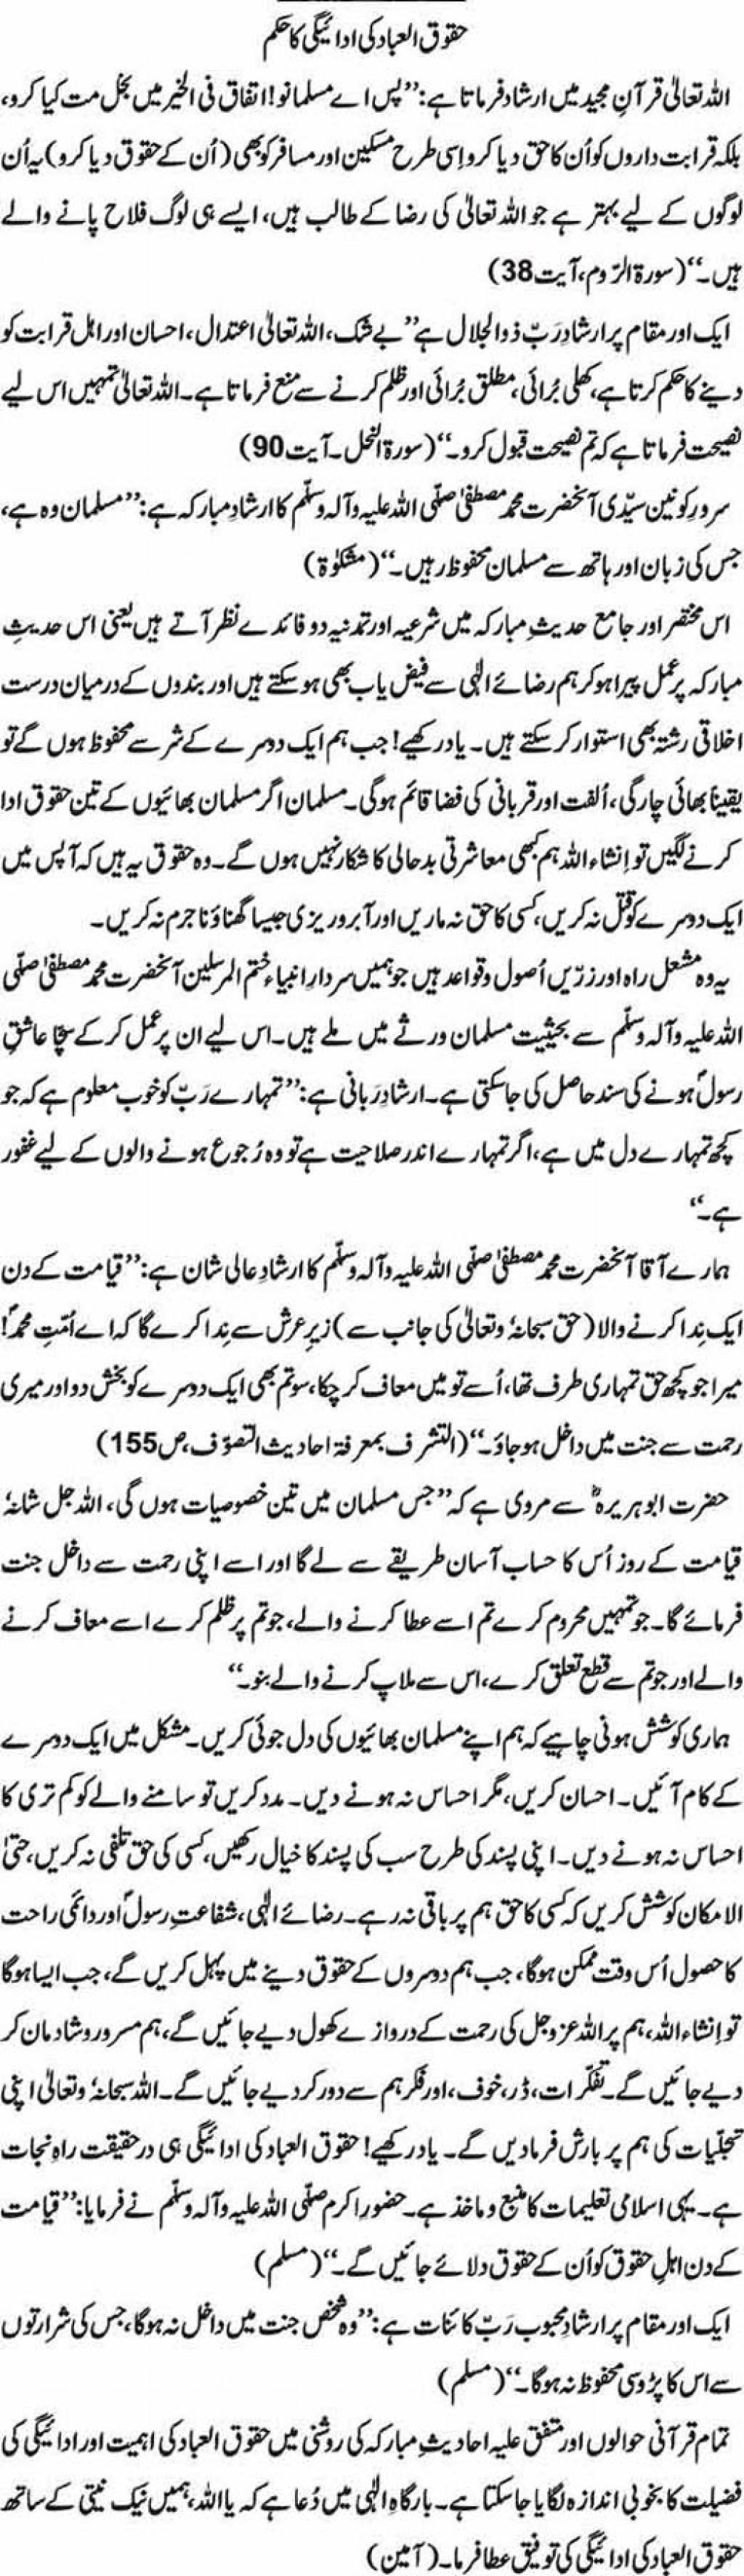 001 Harkat Mein Barkat Essay In Urdu Example Haququl Amazing On Topic Hai Short Large